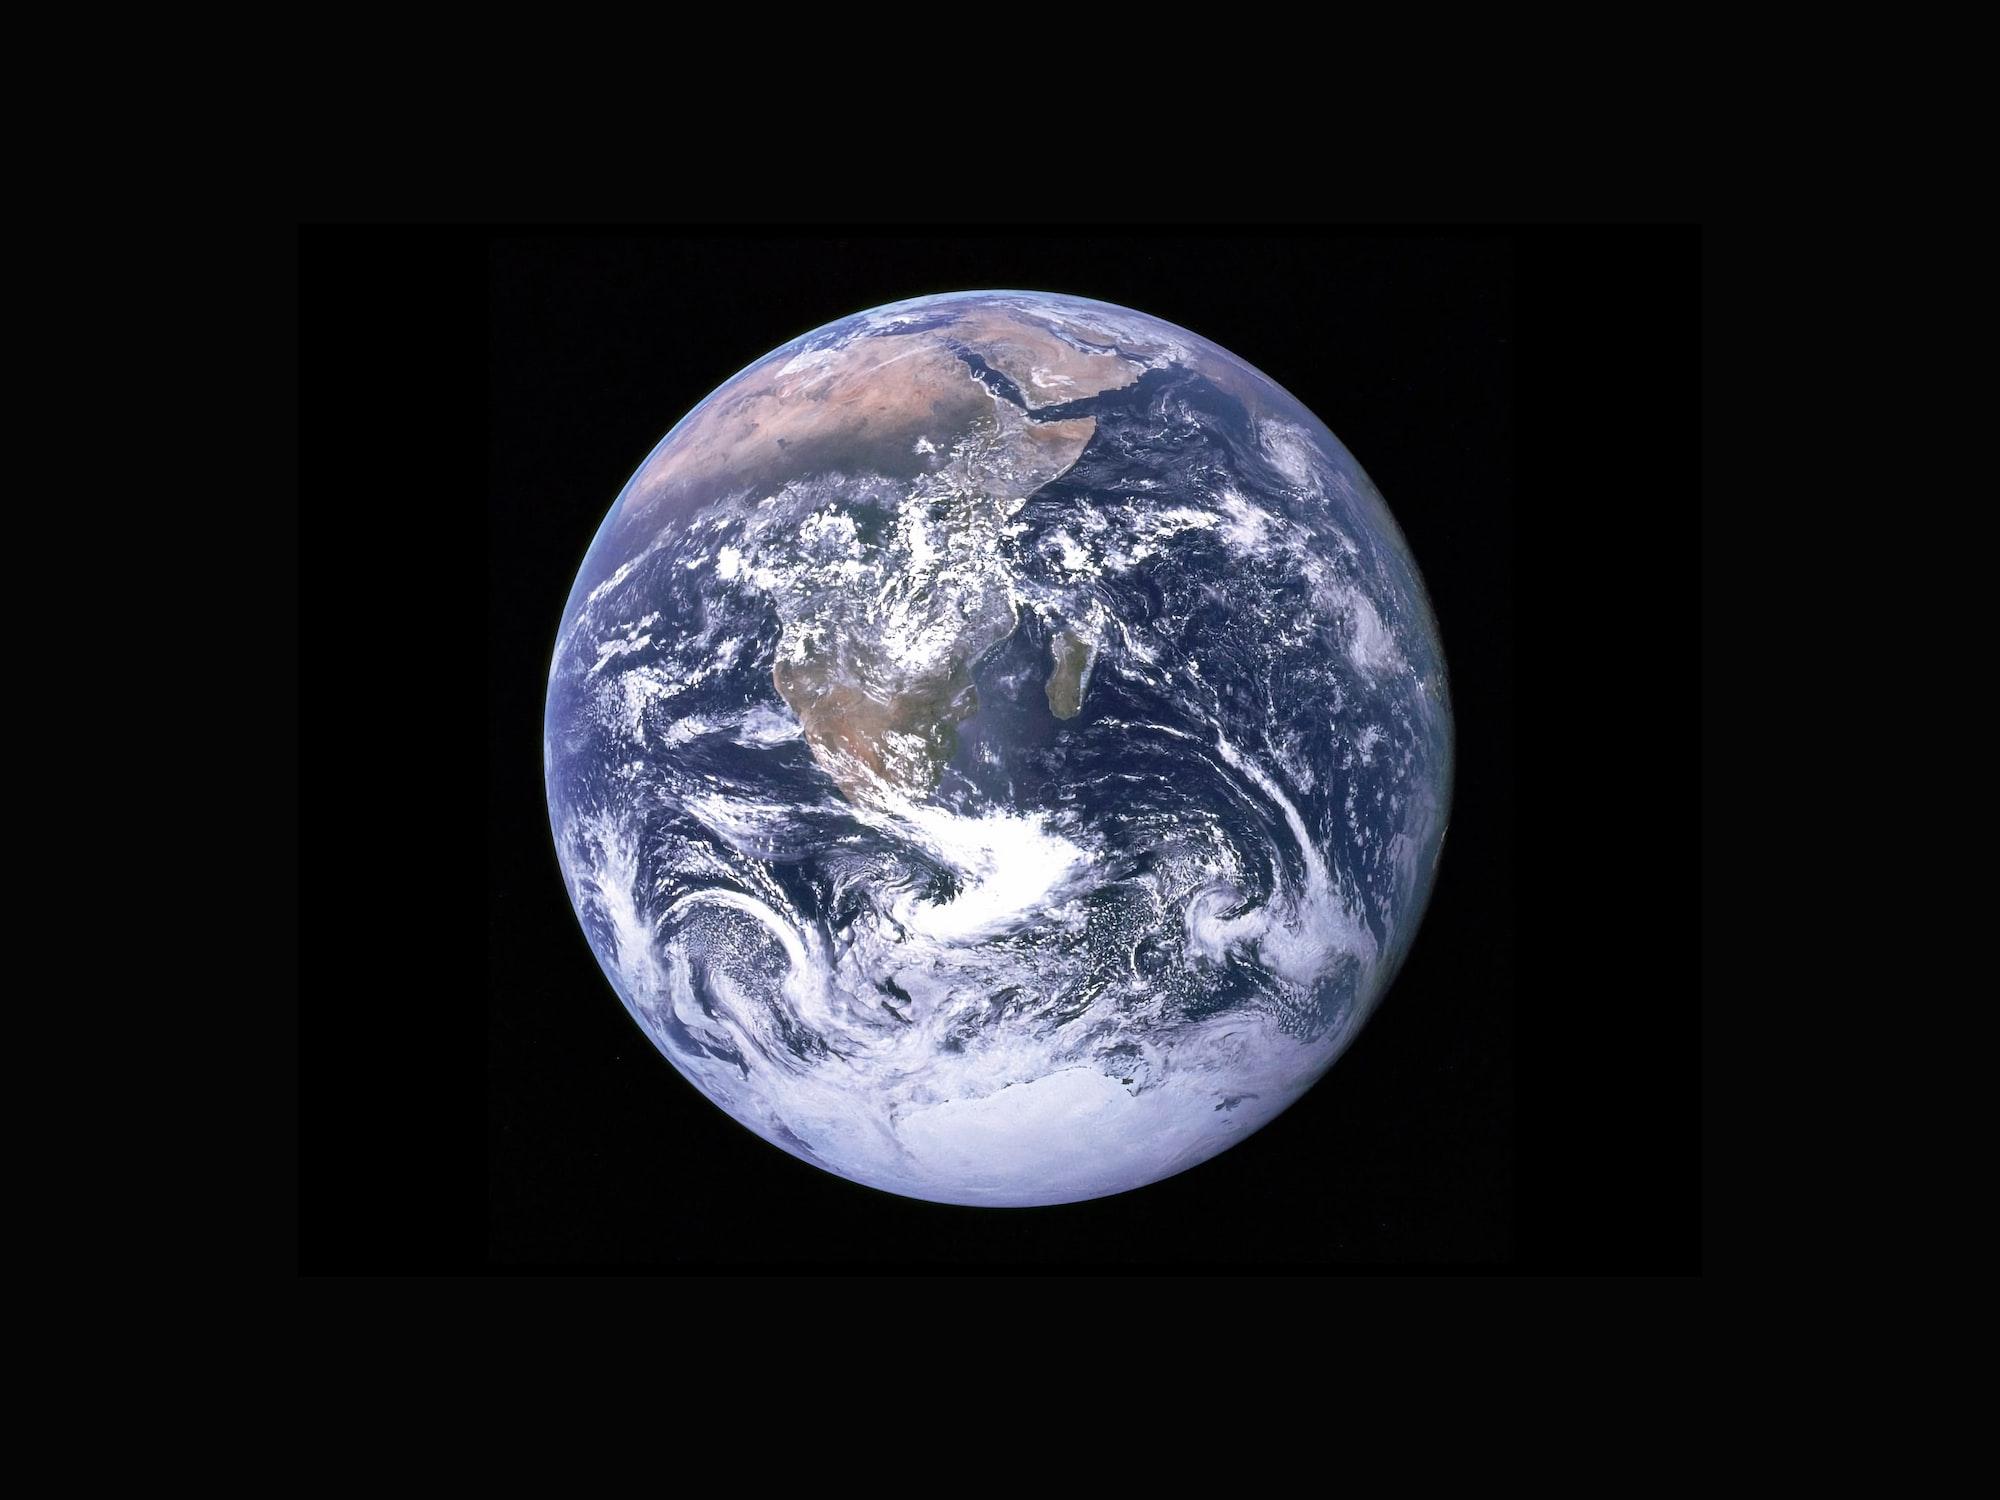 Stream A Perfect Planet by David Attenborough on BBC iPlayer